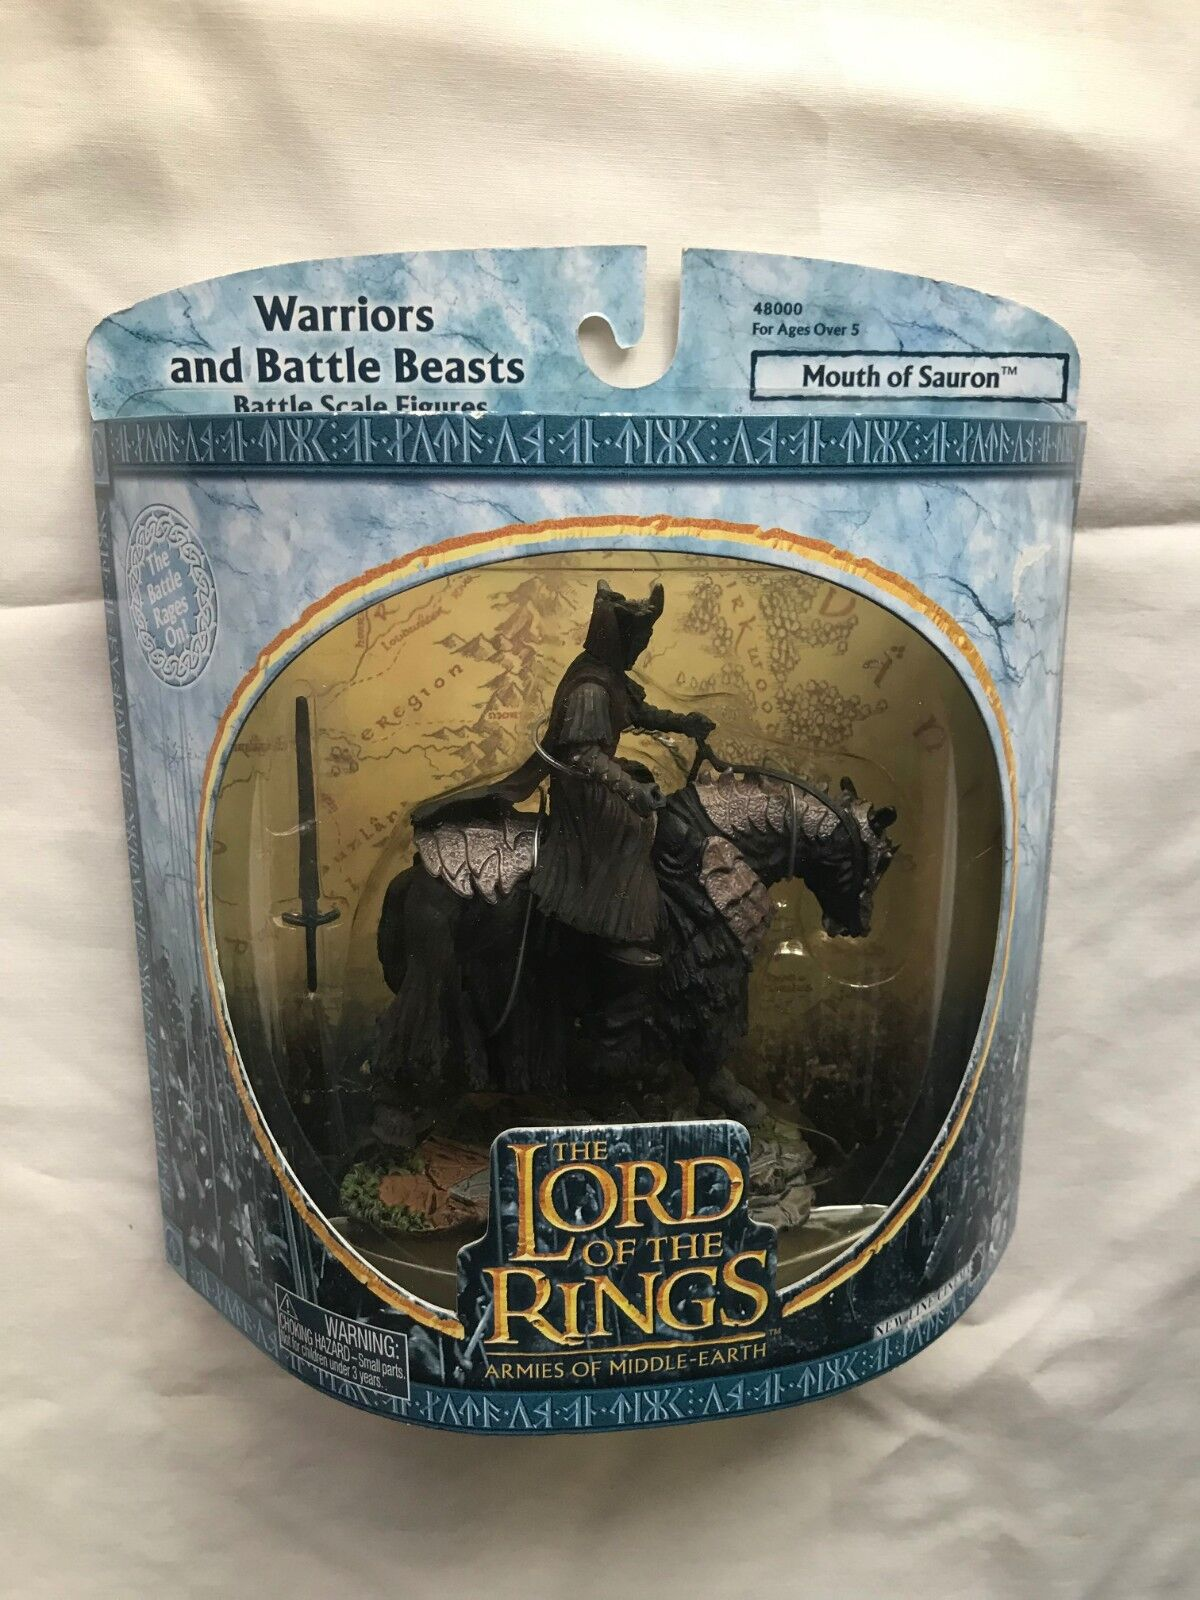 Señor de los anillos el señor de los anillos aome Guerreros & Besteias Boca De Sauron